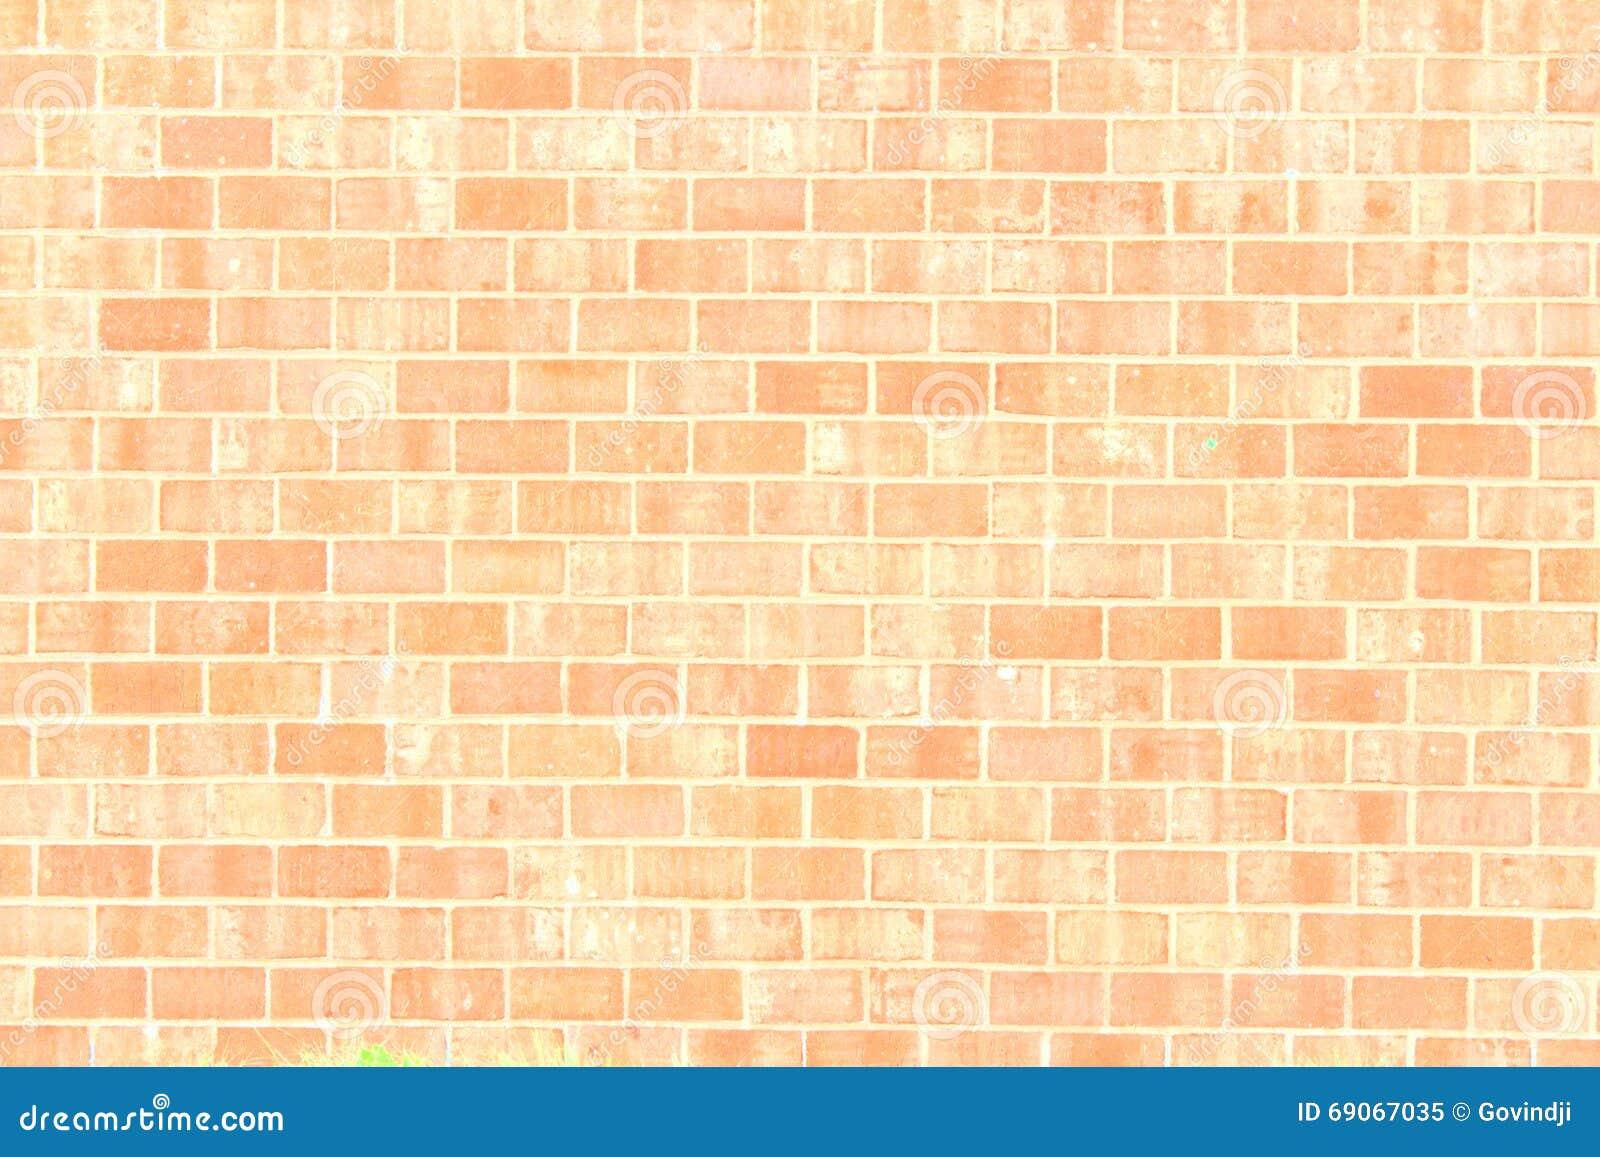 Perfect Clip Art Brick Wall Photos - All About Wallart - adelgazare.info